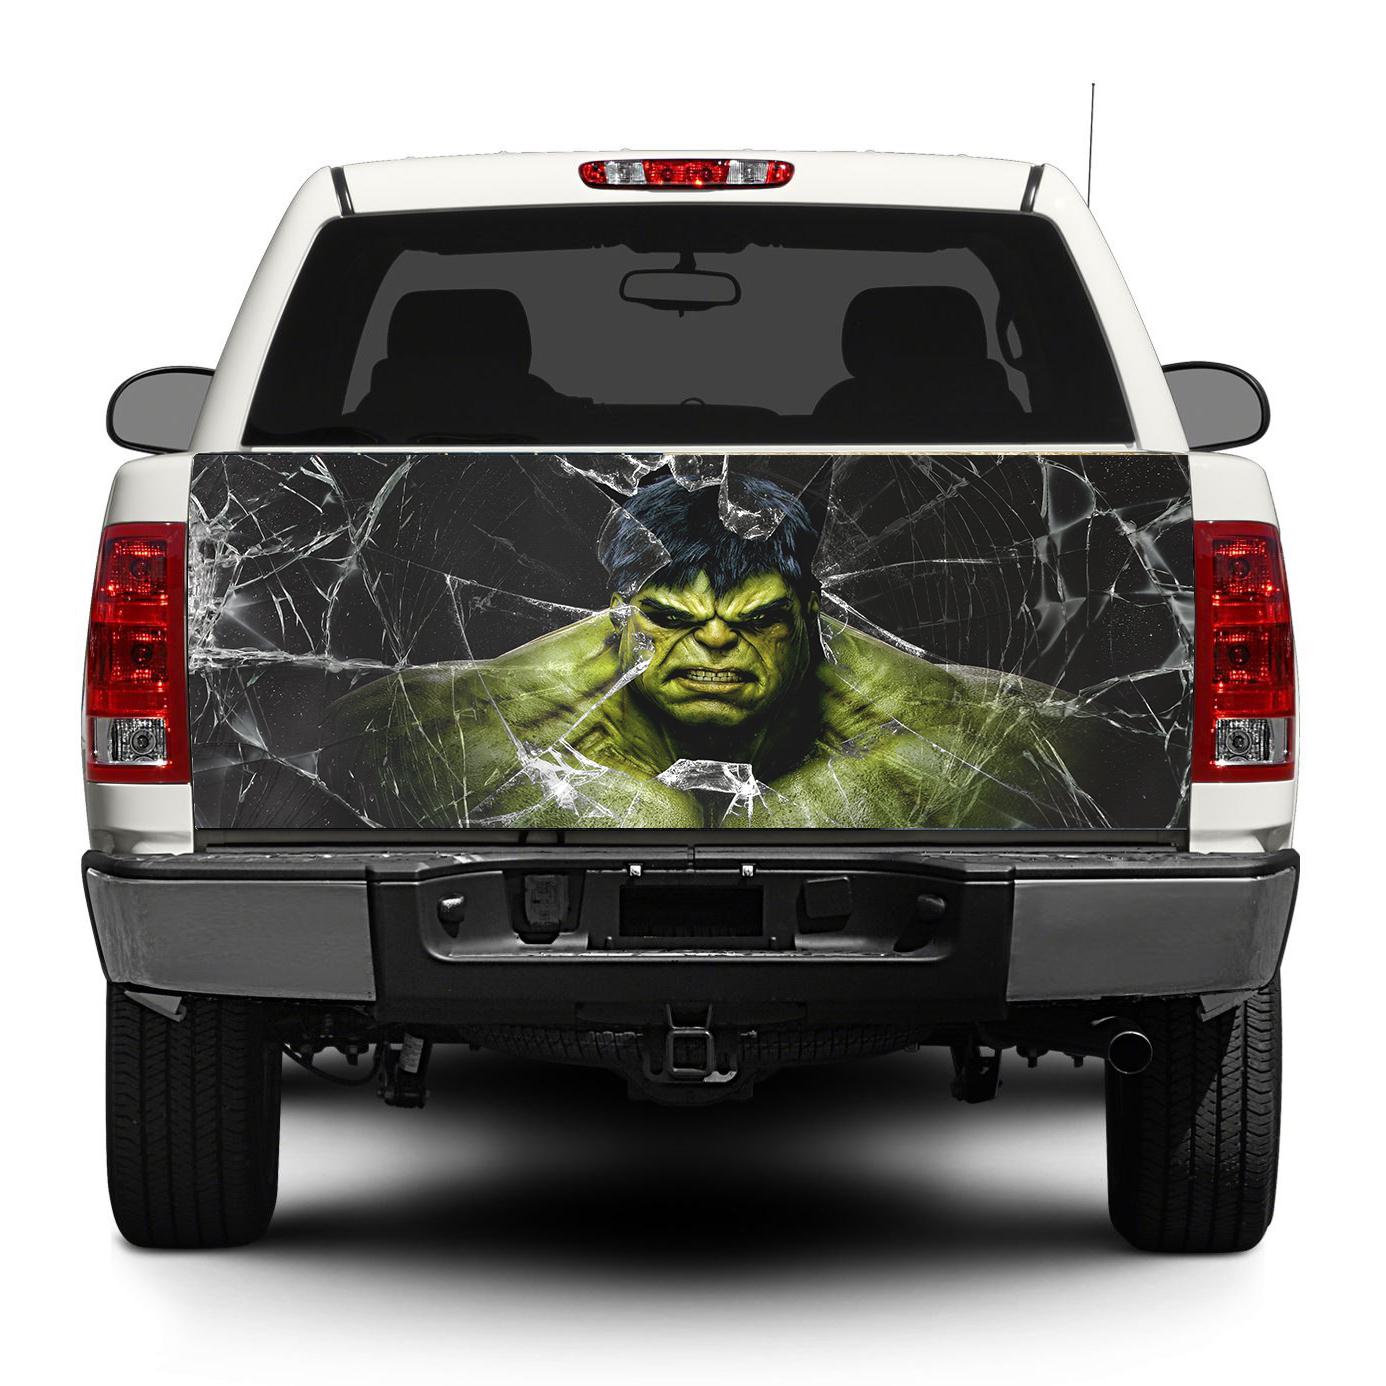 Hulk and broken glass tailgate decal sticker wrap pick up truck suv car